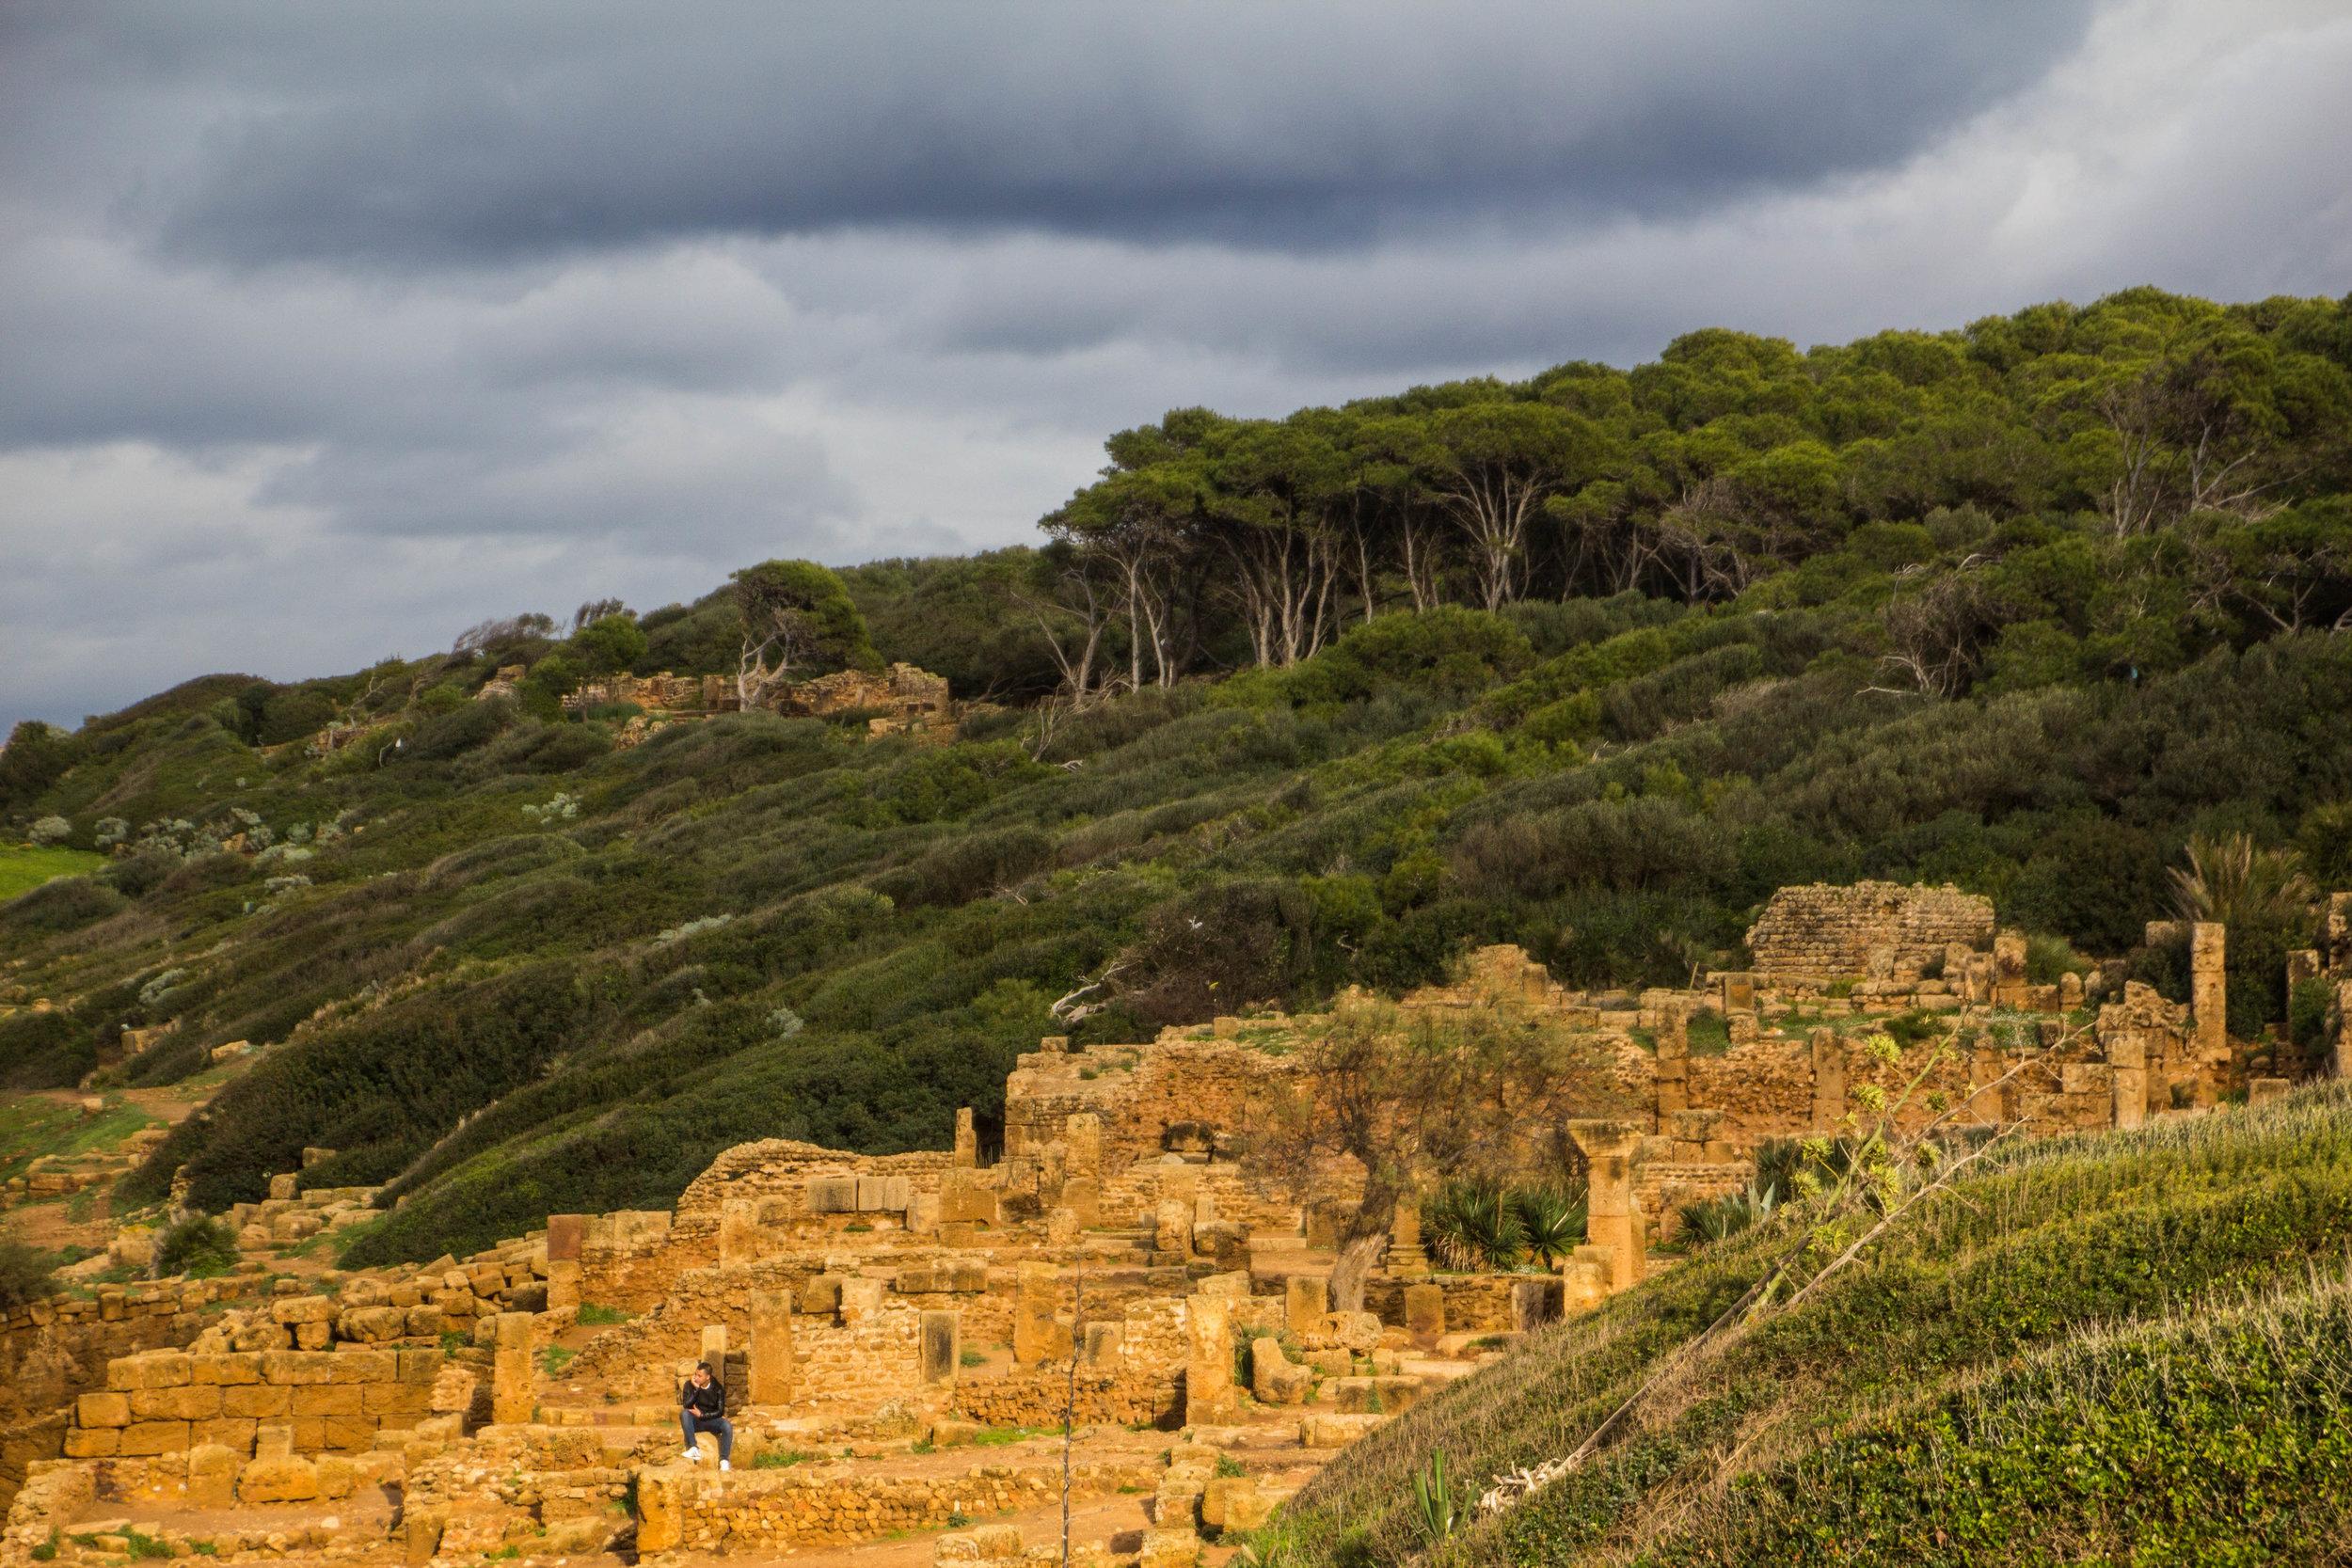 tipiza-roman-ruins-algeria-24.jpg